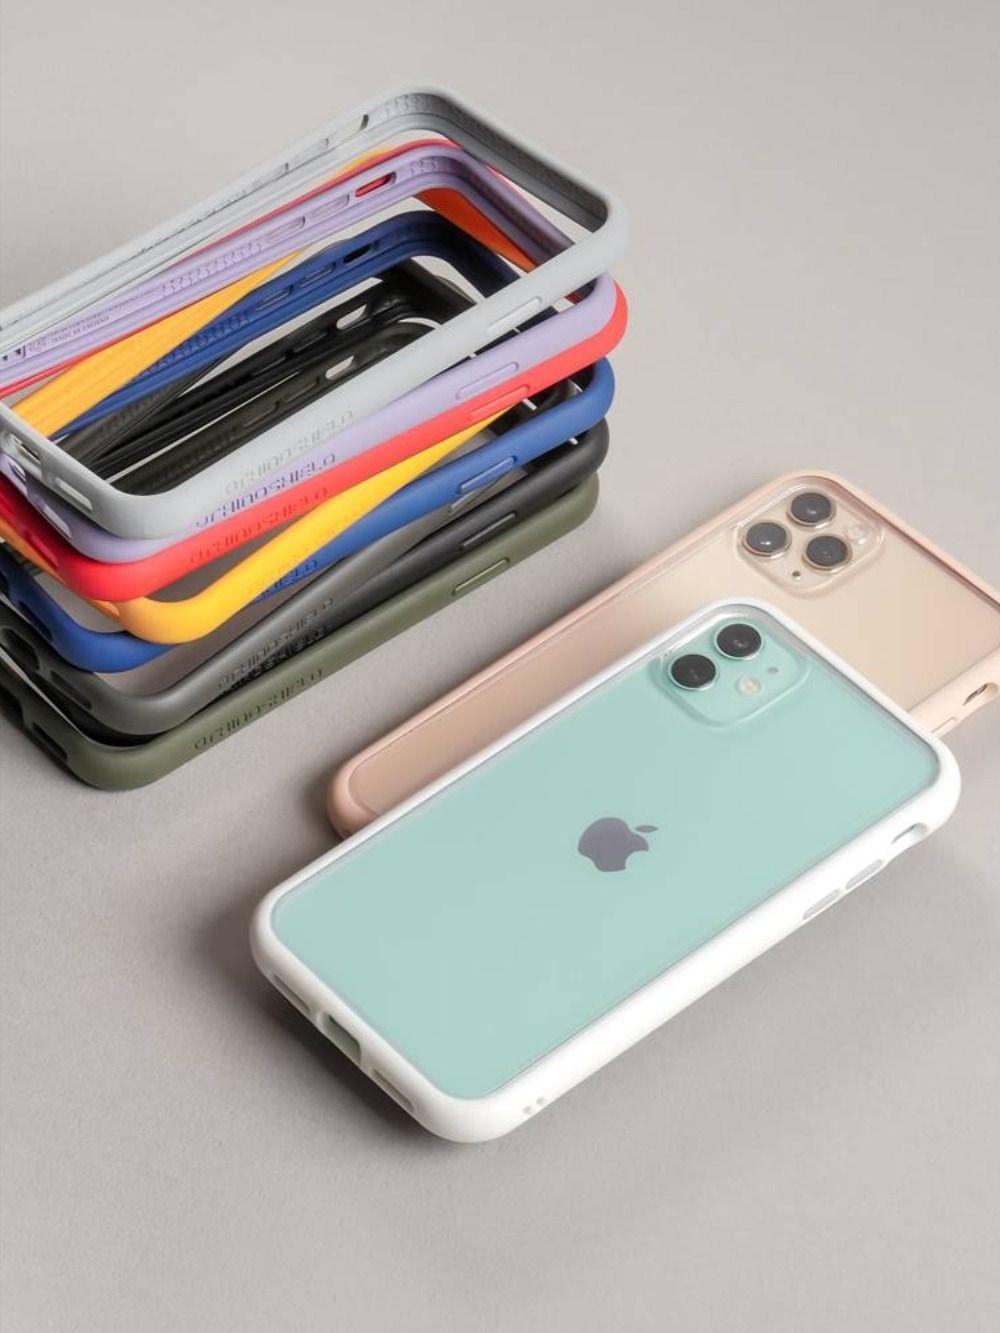 Iphone 11 11 Pro Cases Rhinoshield In 2020 Iphone Trendy Phone Cases Stylish Phone Case